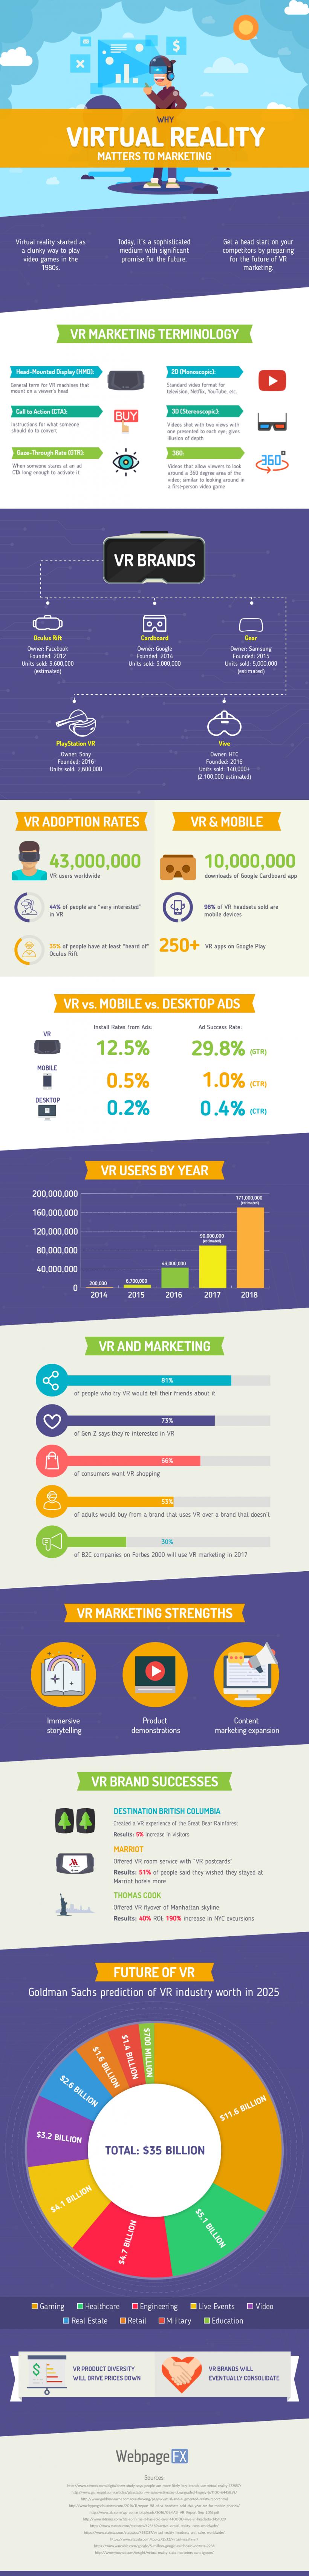 Infographie VR